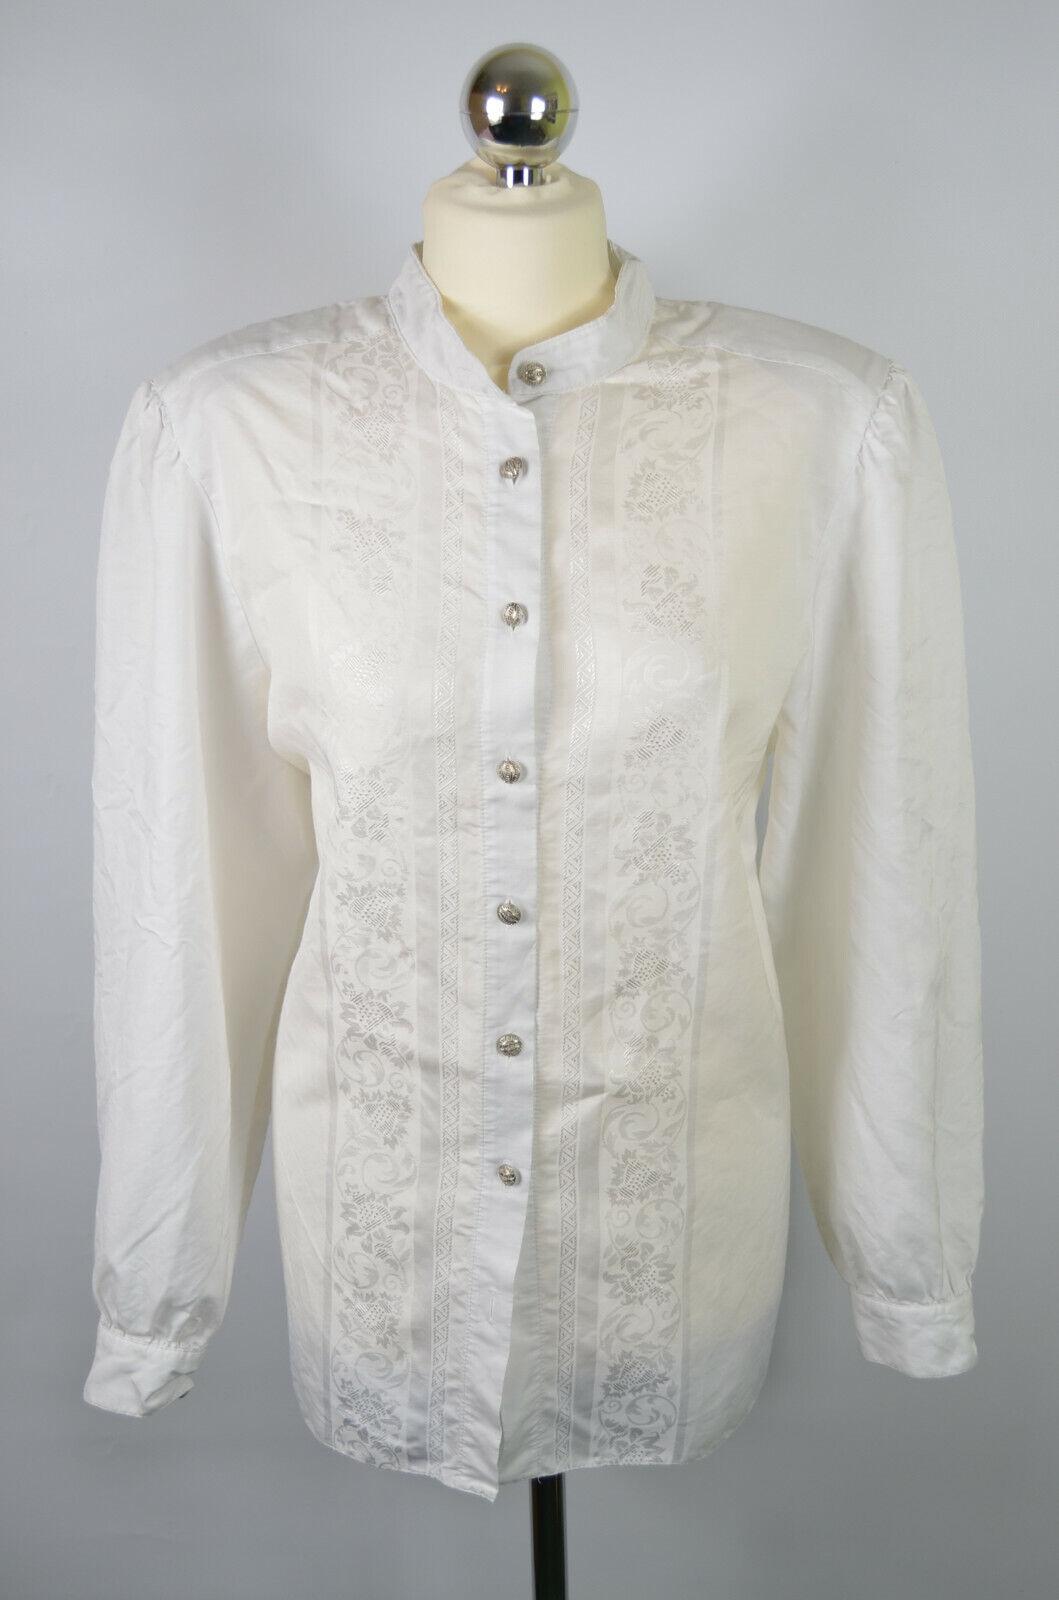 ST.MICHAEL WOMENS SHIRT (20 50) WHITE HEMD LADIES BUTTONS TRACHTEN BAVARIA TOP